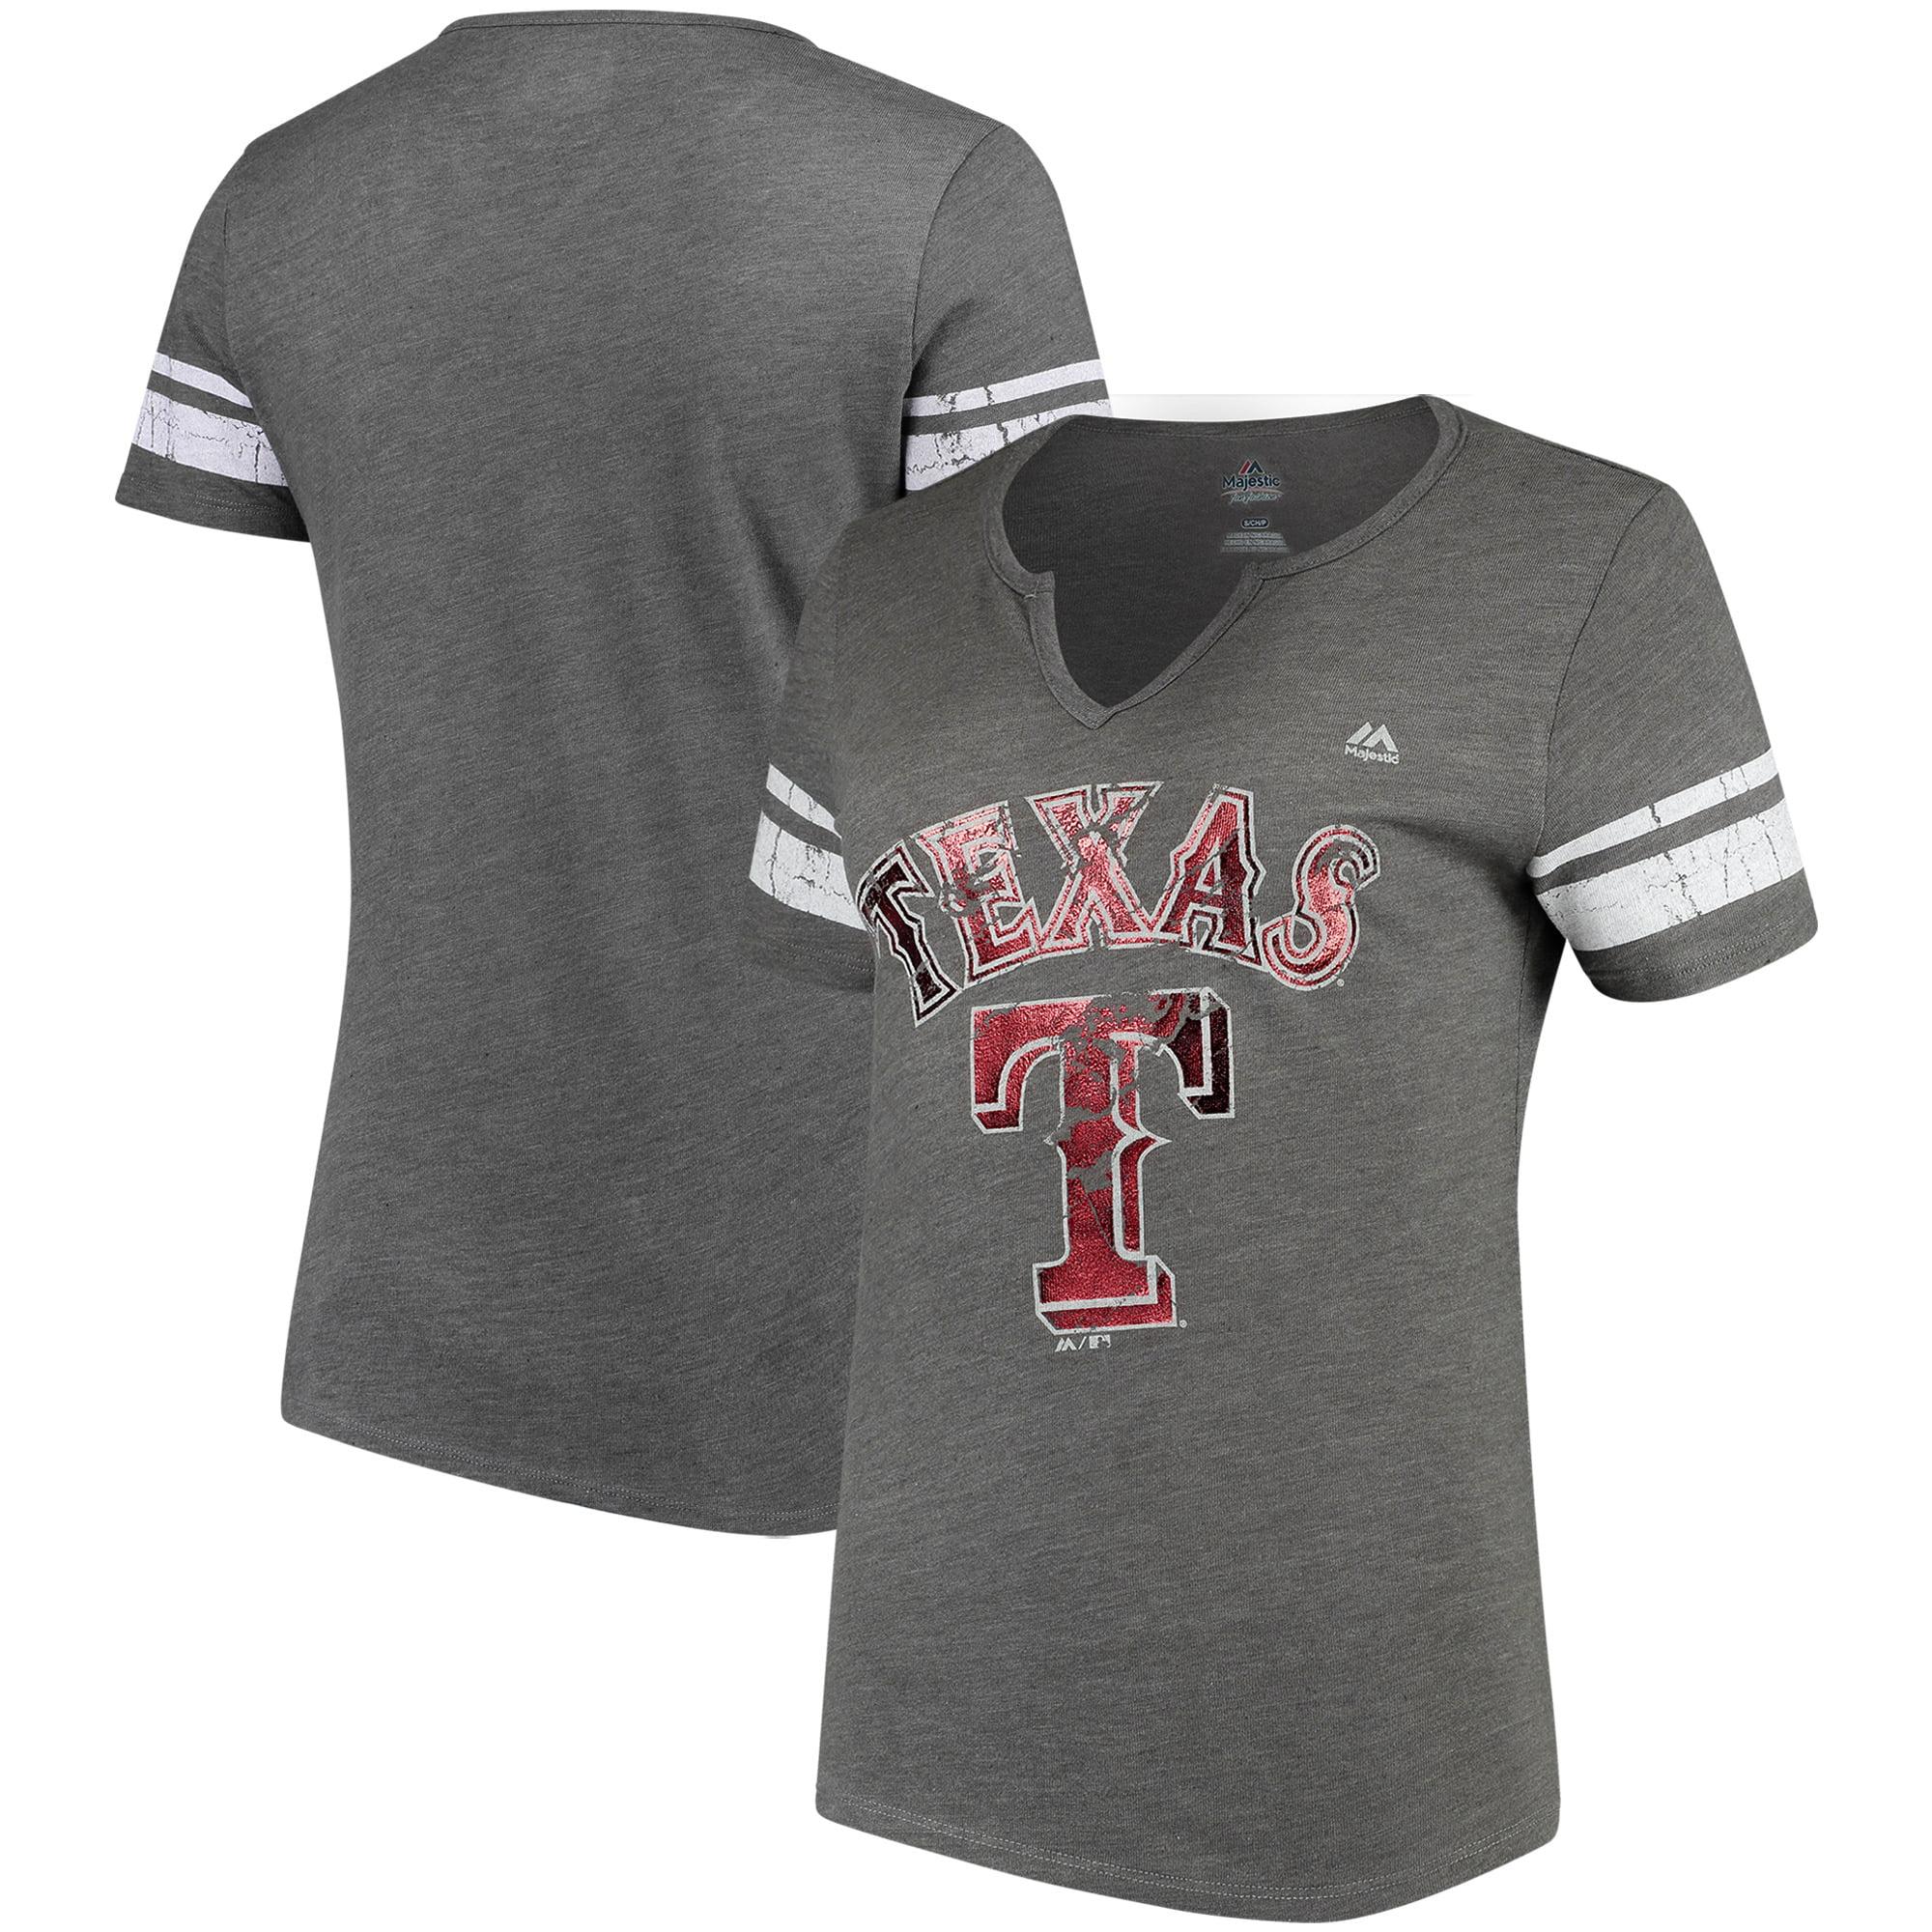 Texas Rangers Majestic Women's Two Seamer V-Notch Tri-Blend T-Shirt - Gray/White